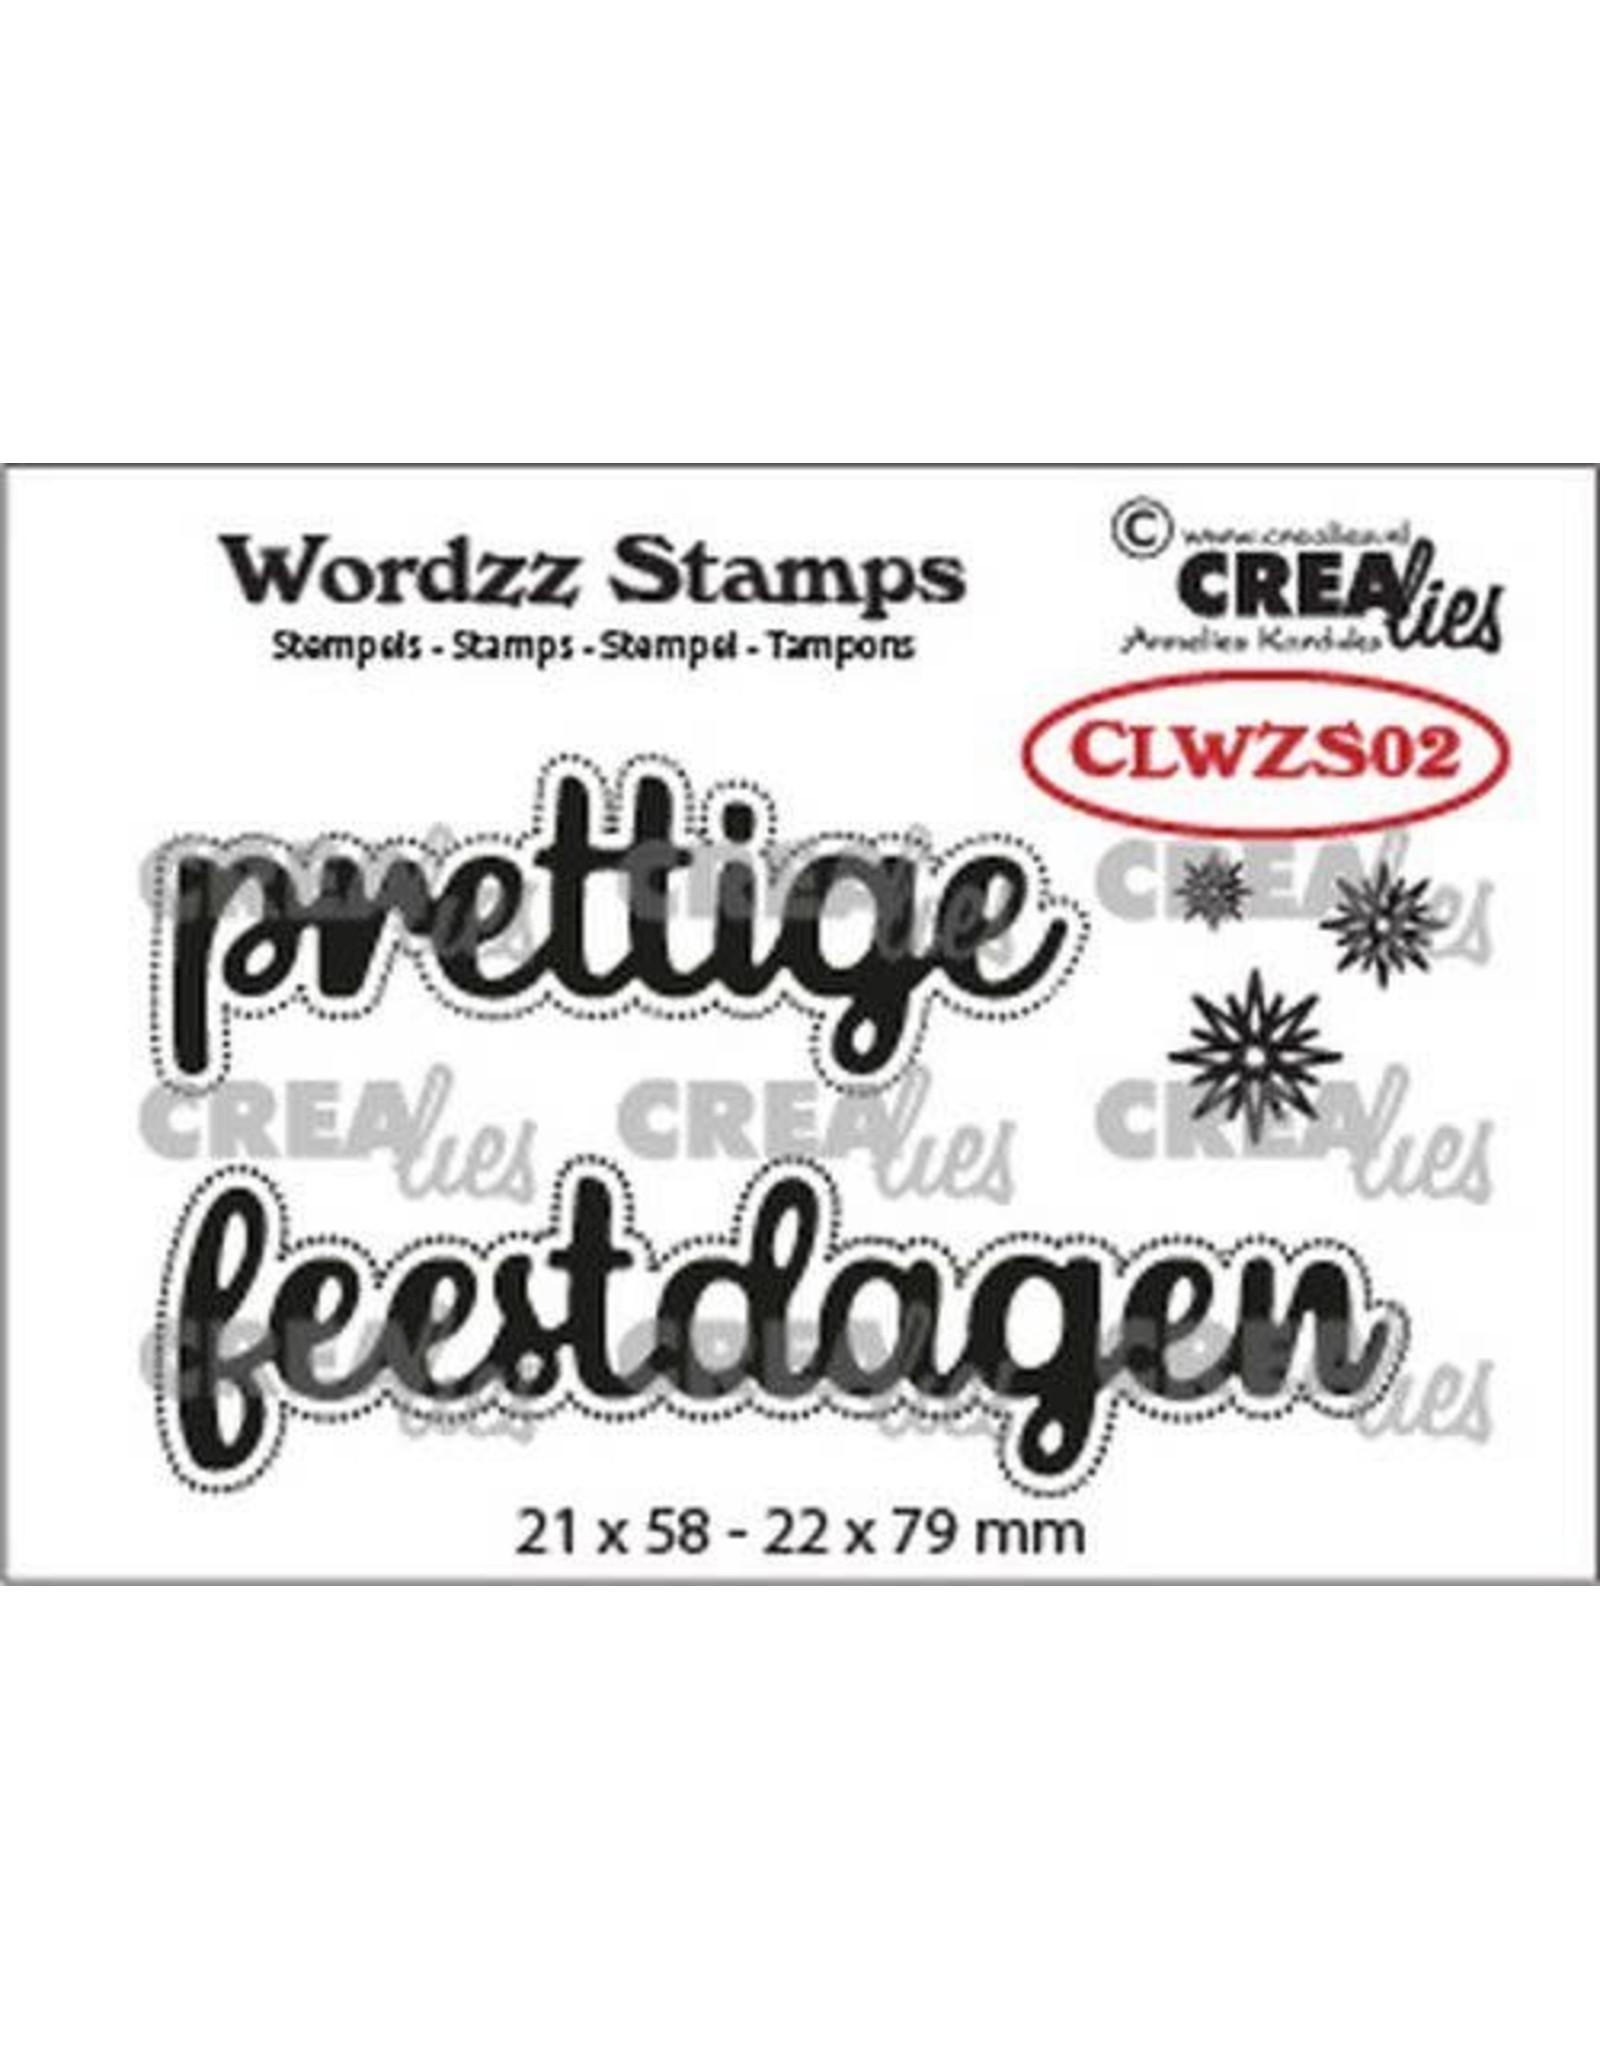 Crealies Crealies Clearstamp Wordzz prettige feestdagen (NL) CLWZS02 22x79 mm